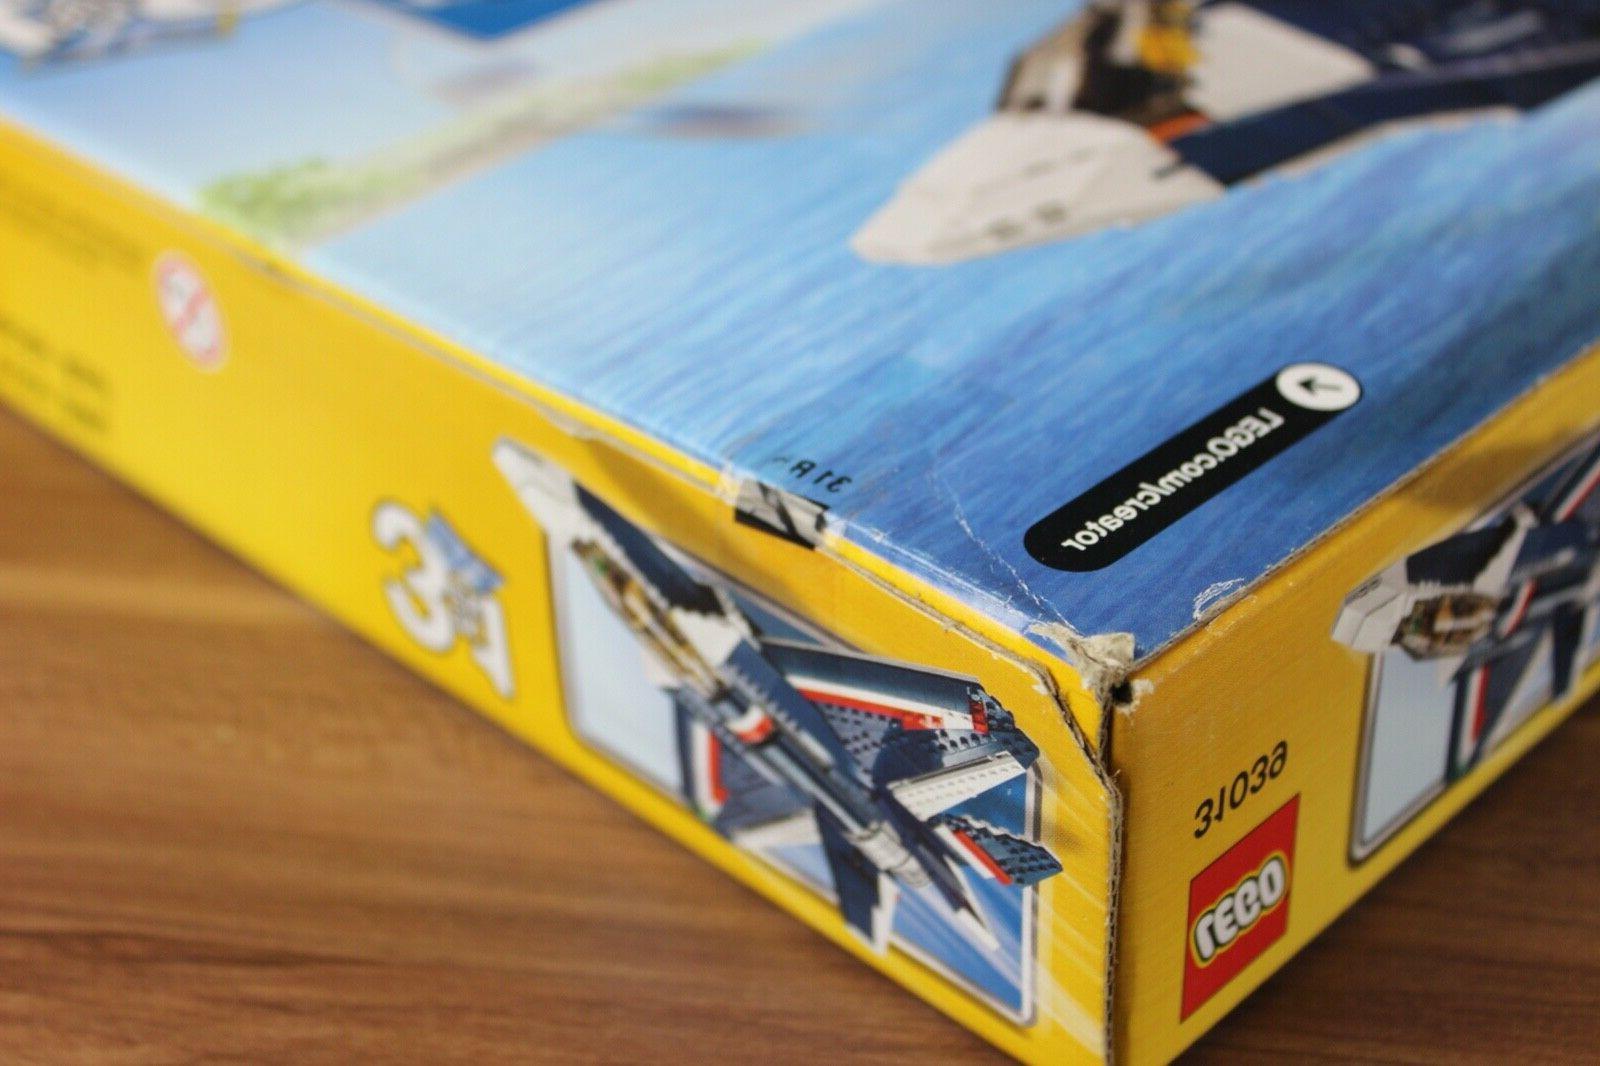 !!Retired!! LEGO Blue in